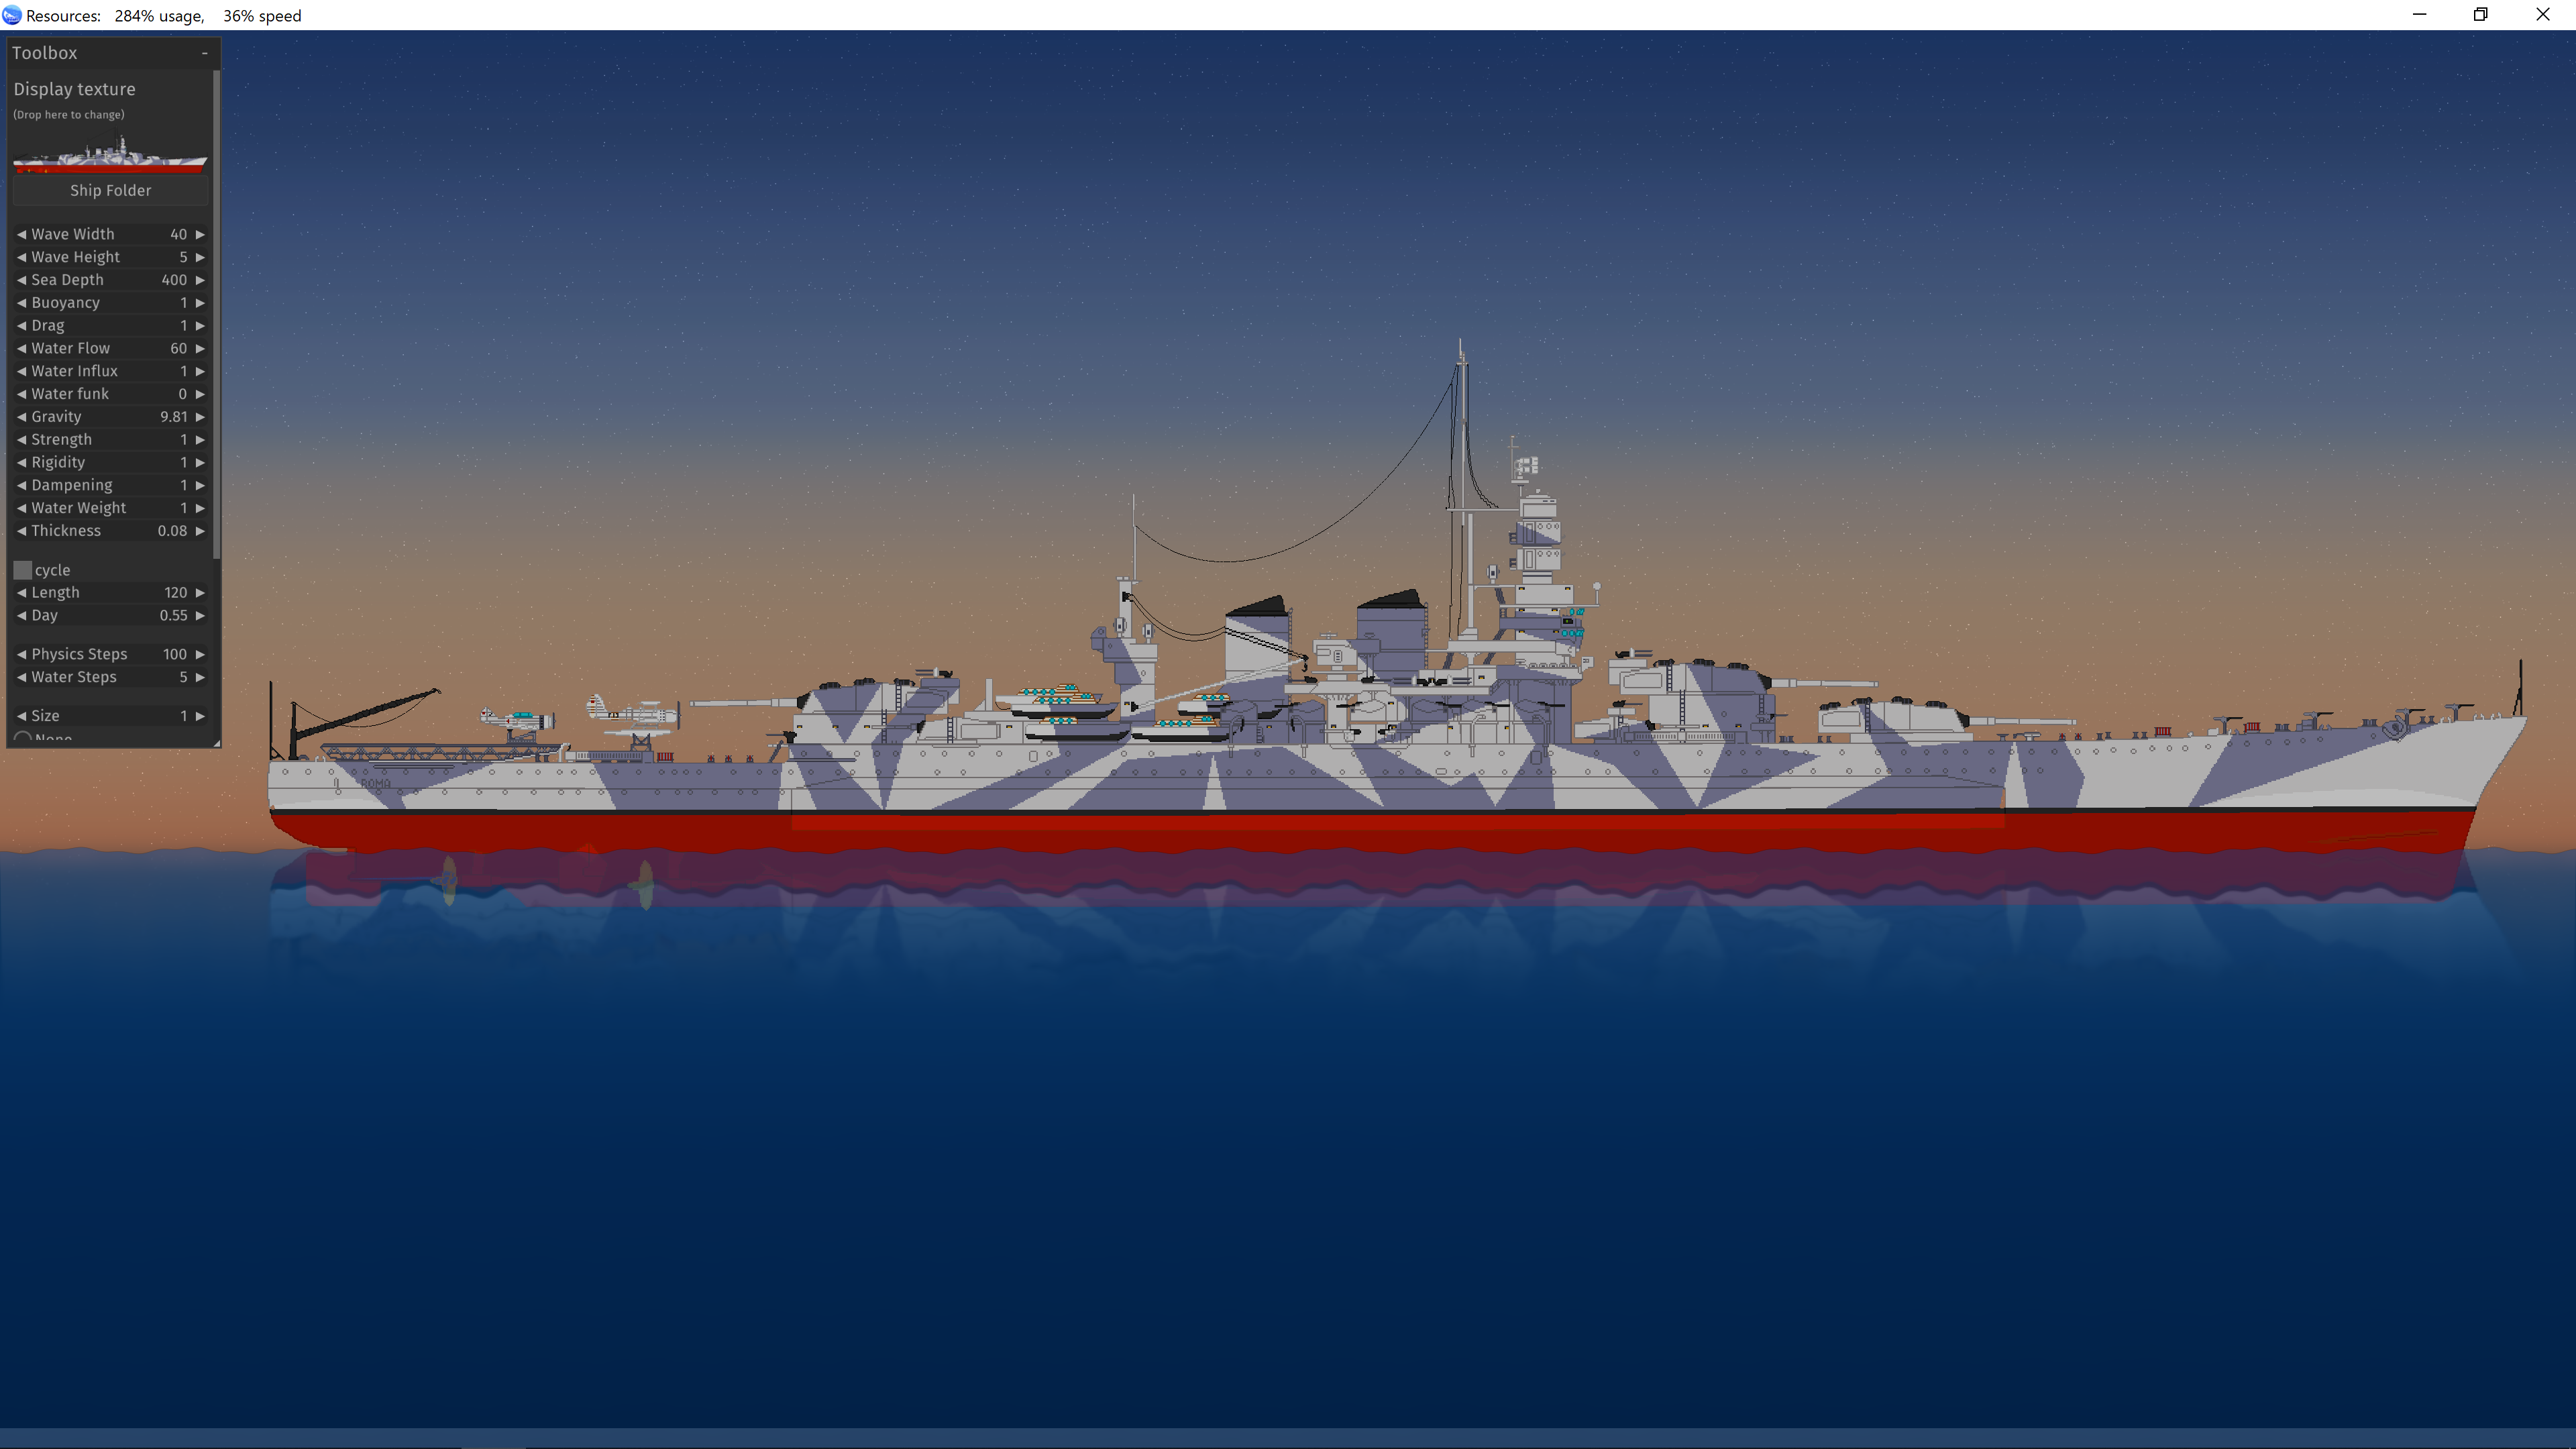 Sinking Simulator 2 Alpha 4.0 file.